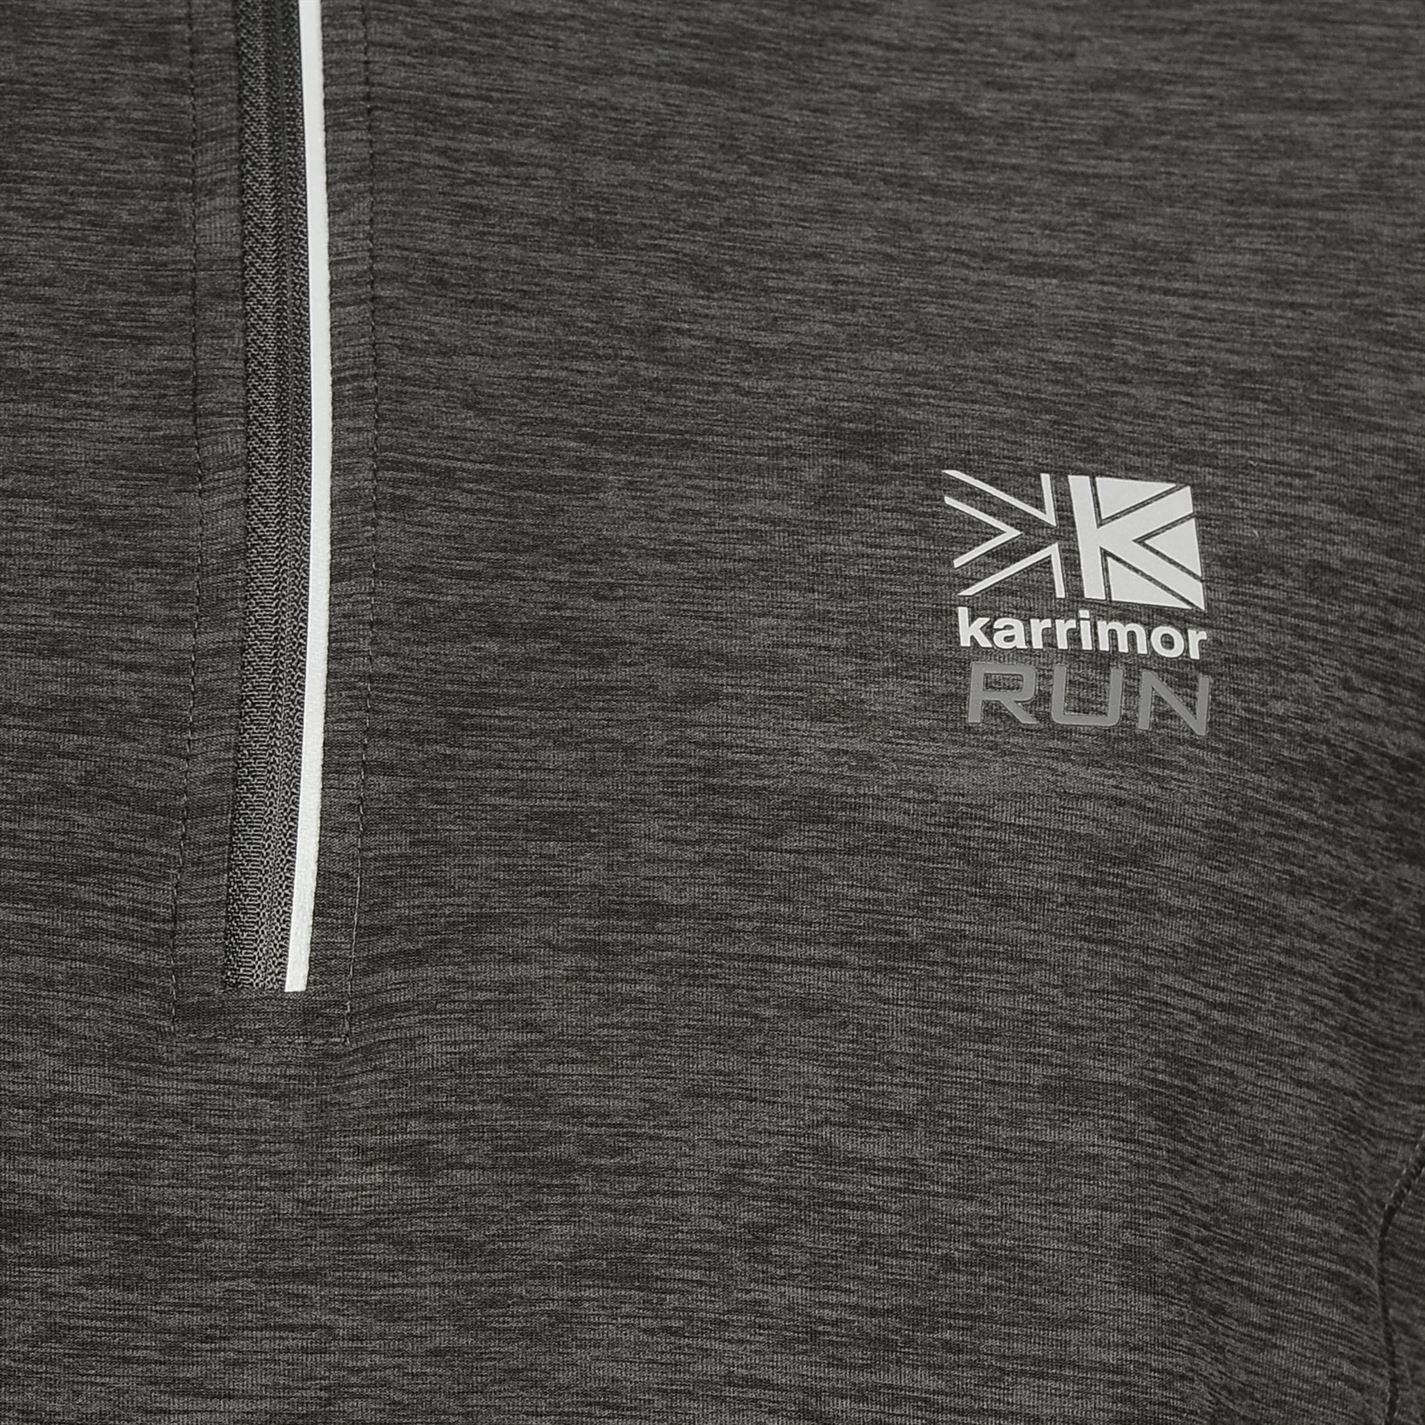 Karrimor-Correr-Mens-X-Cremallera-Camiseta-Camiseta-Top-Transpirable-Ligero-Mentonera miniatura 7